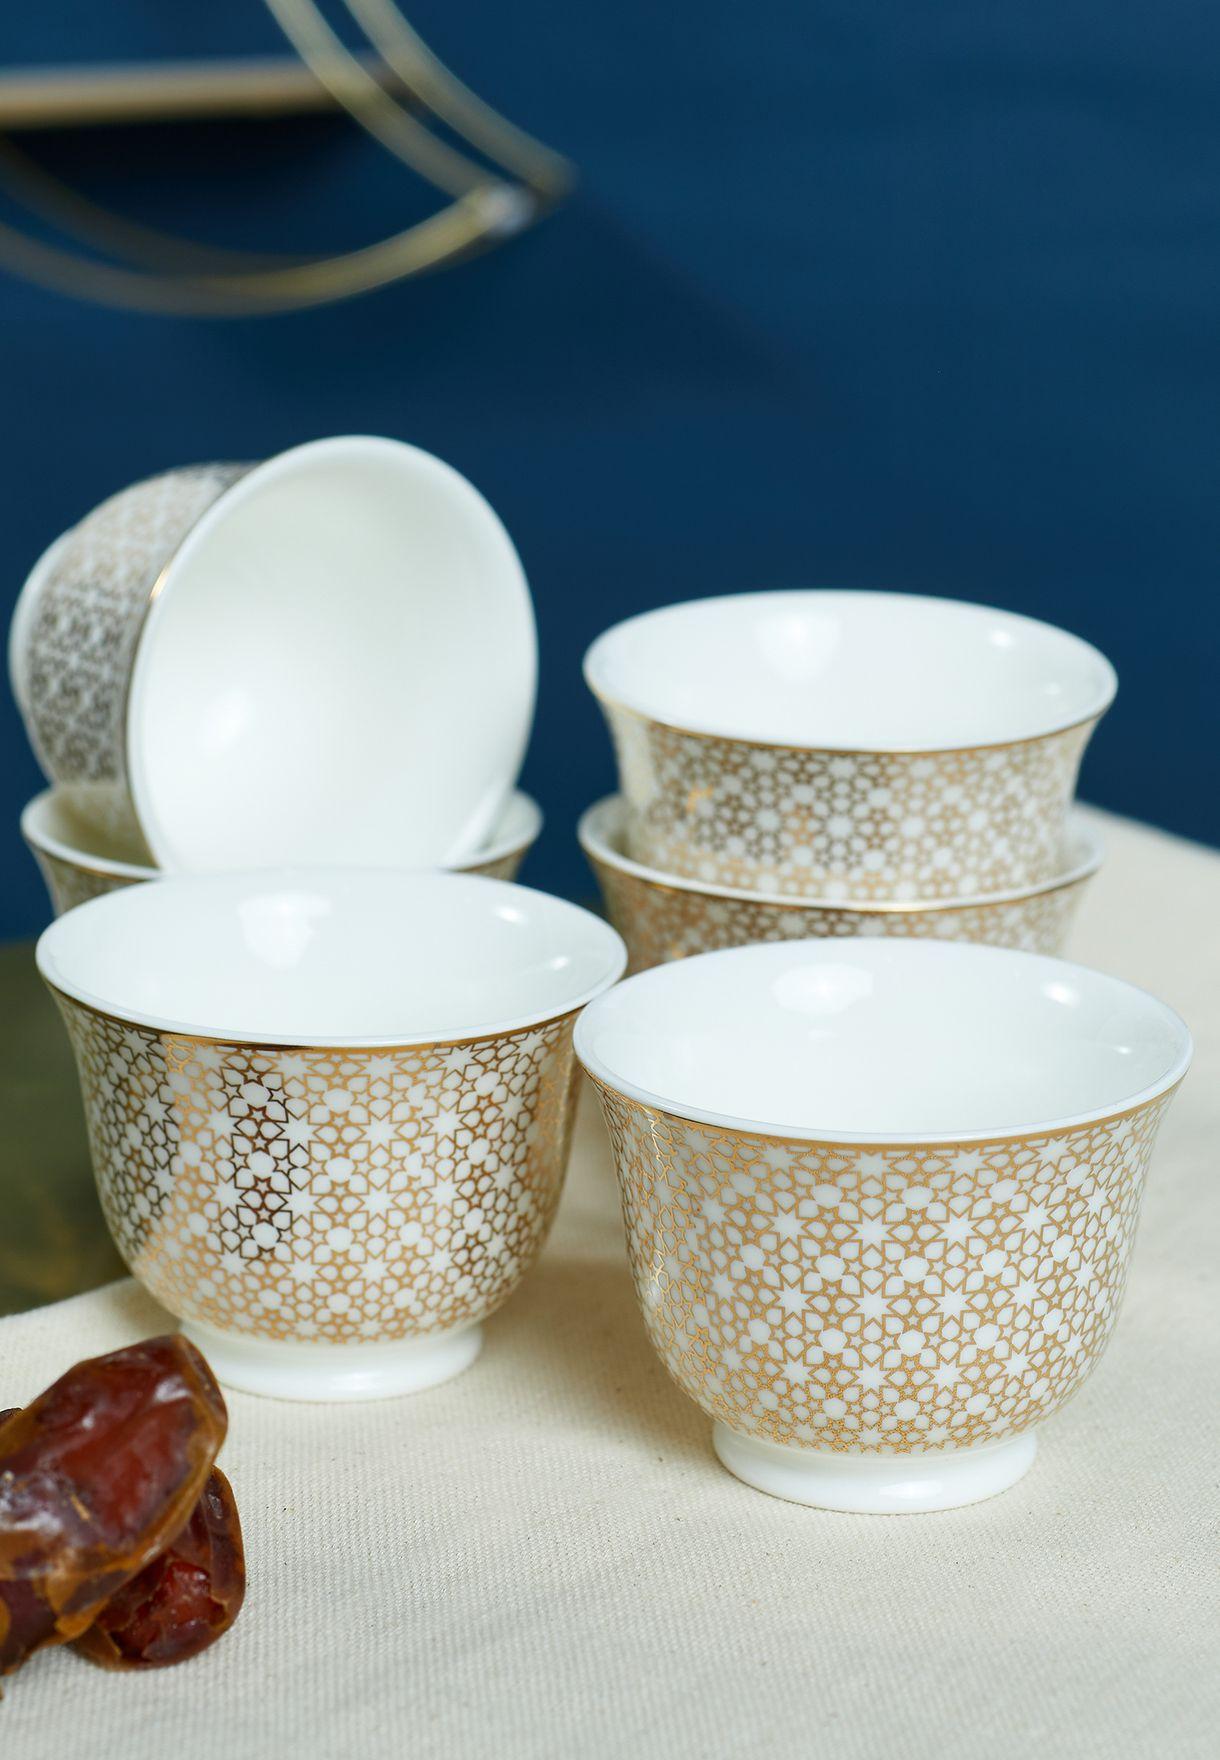 Set of 6 Chaffe Arcade Cup